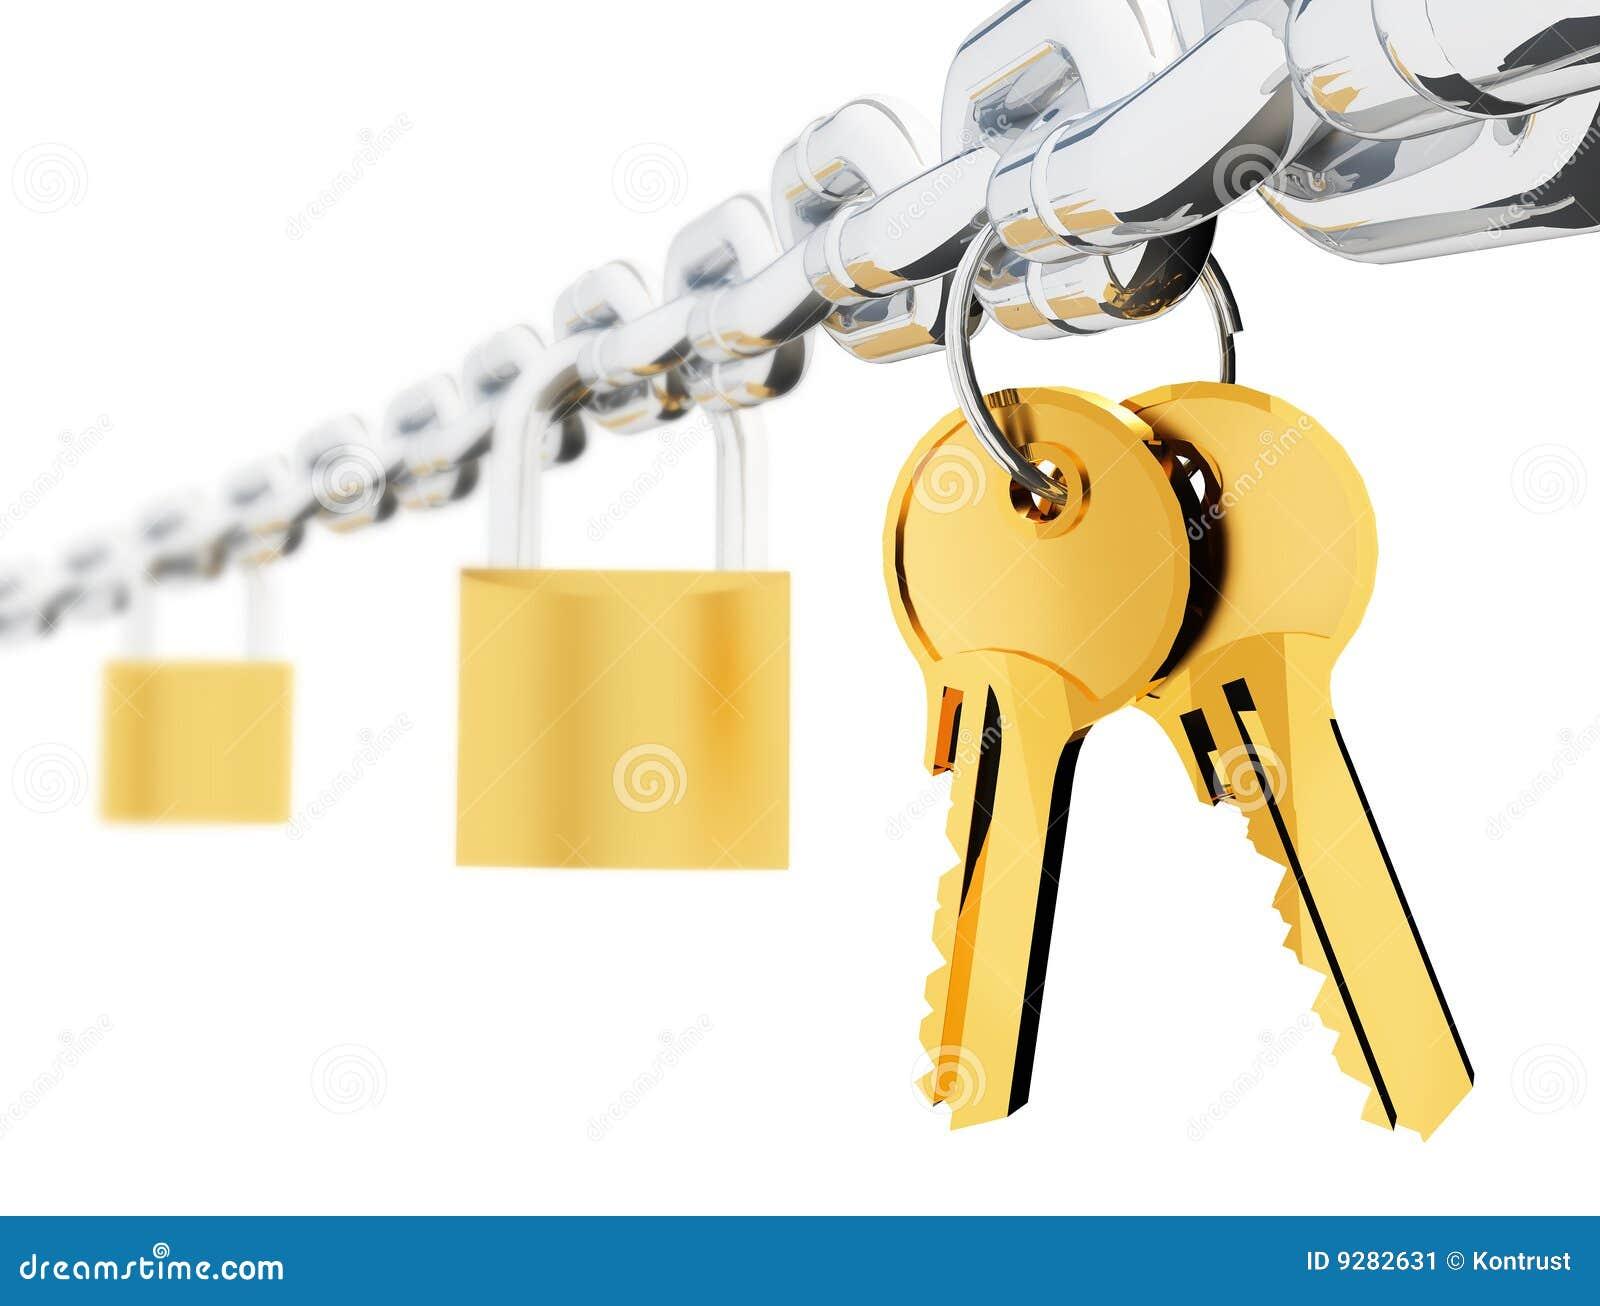 Chain locks and keys